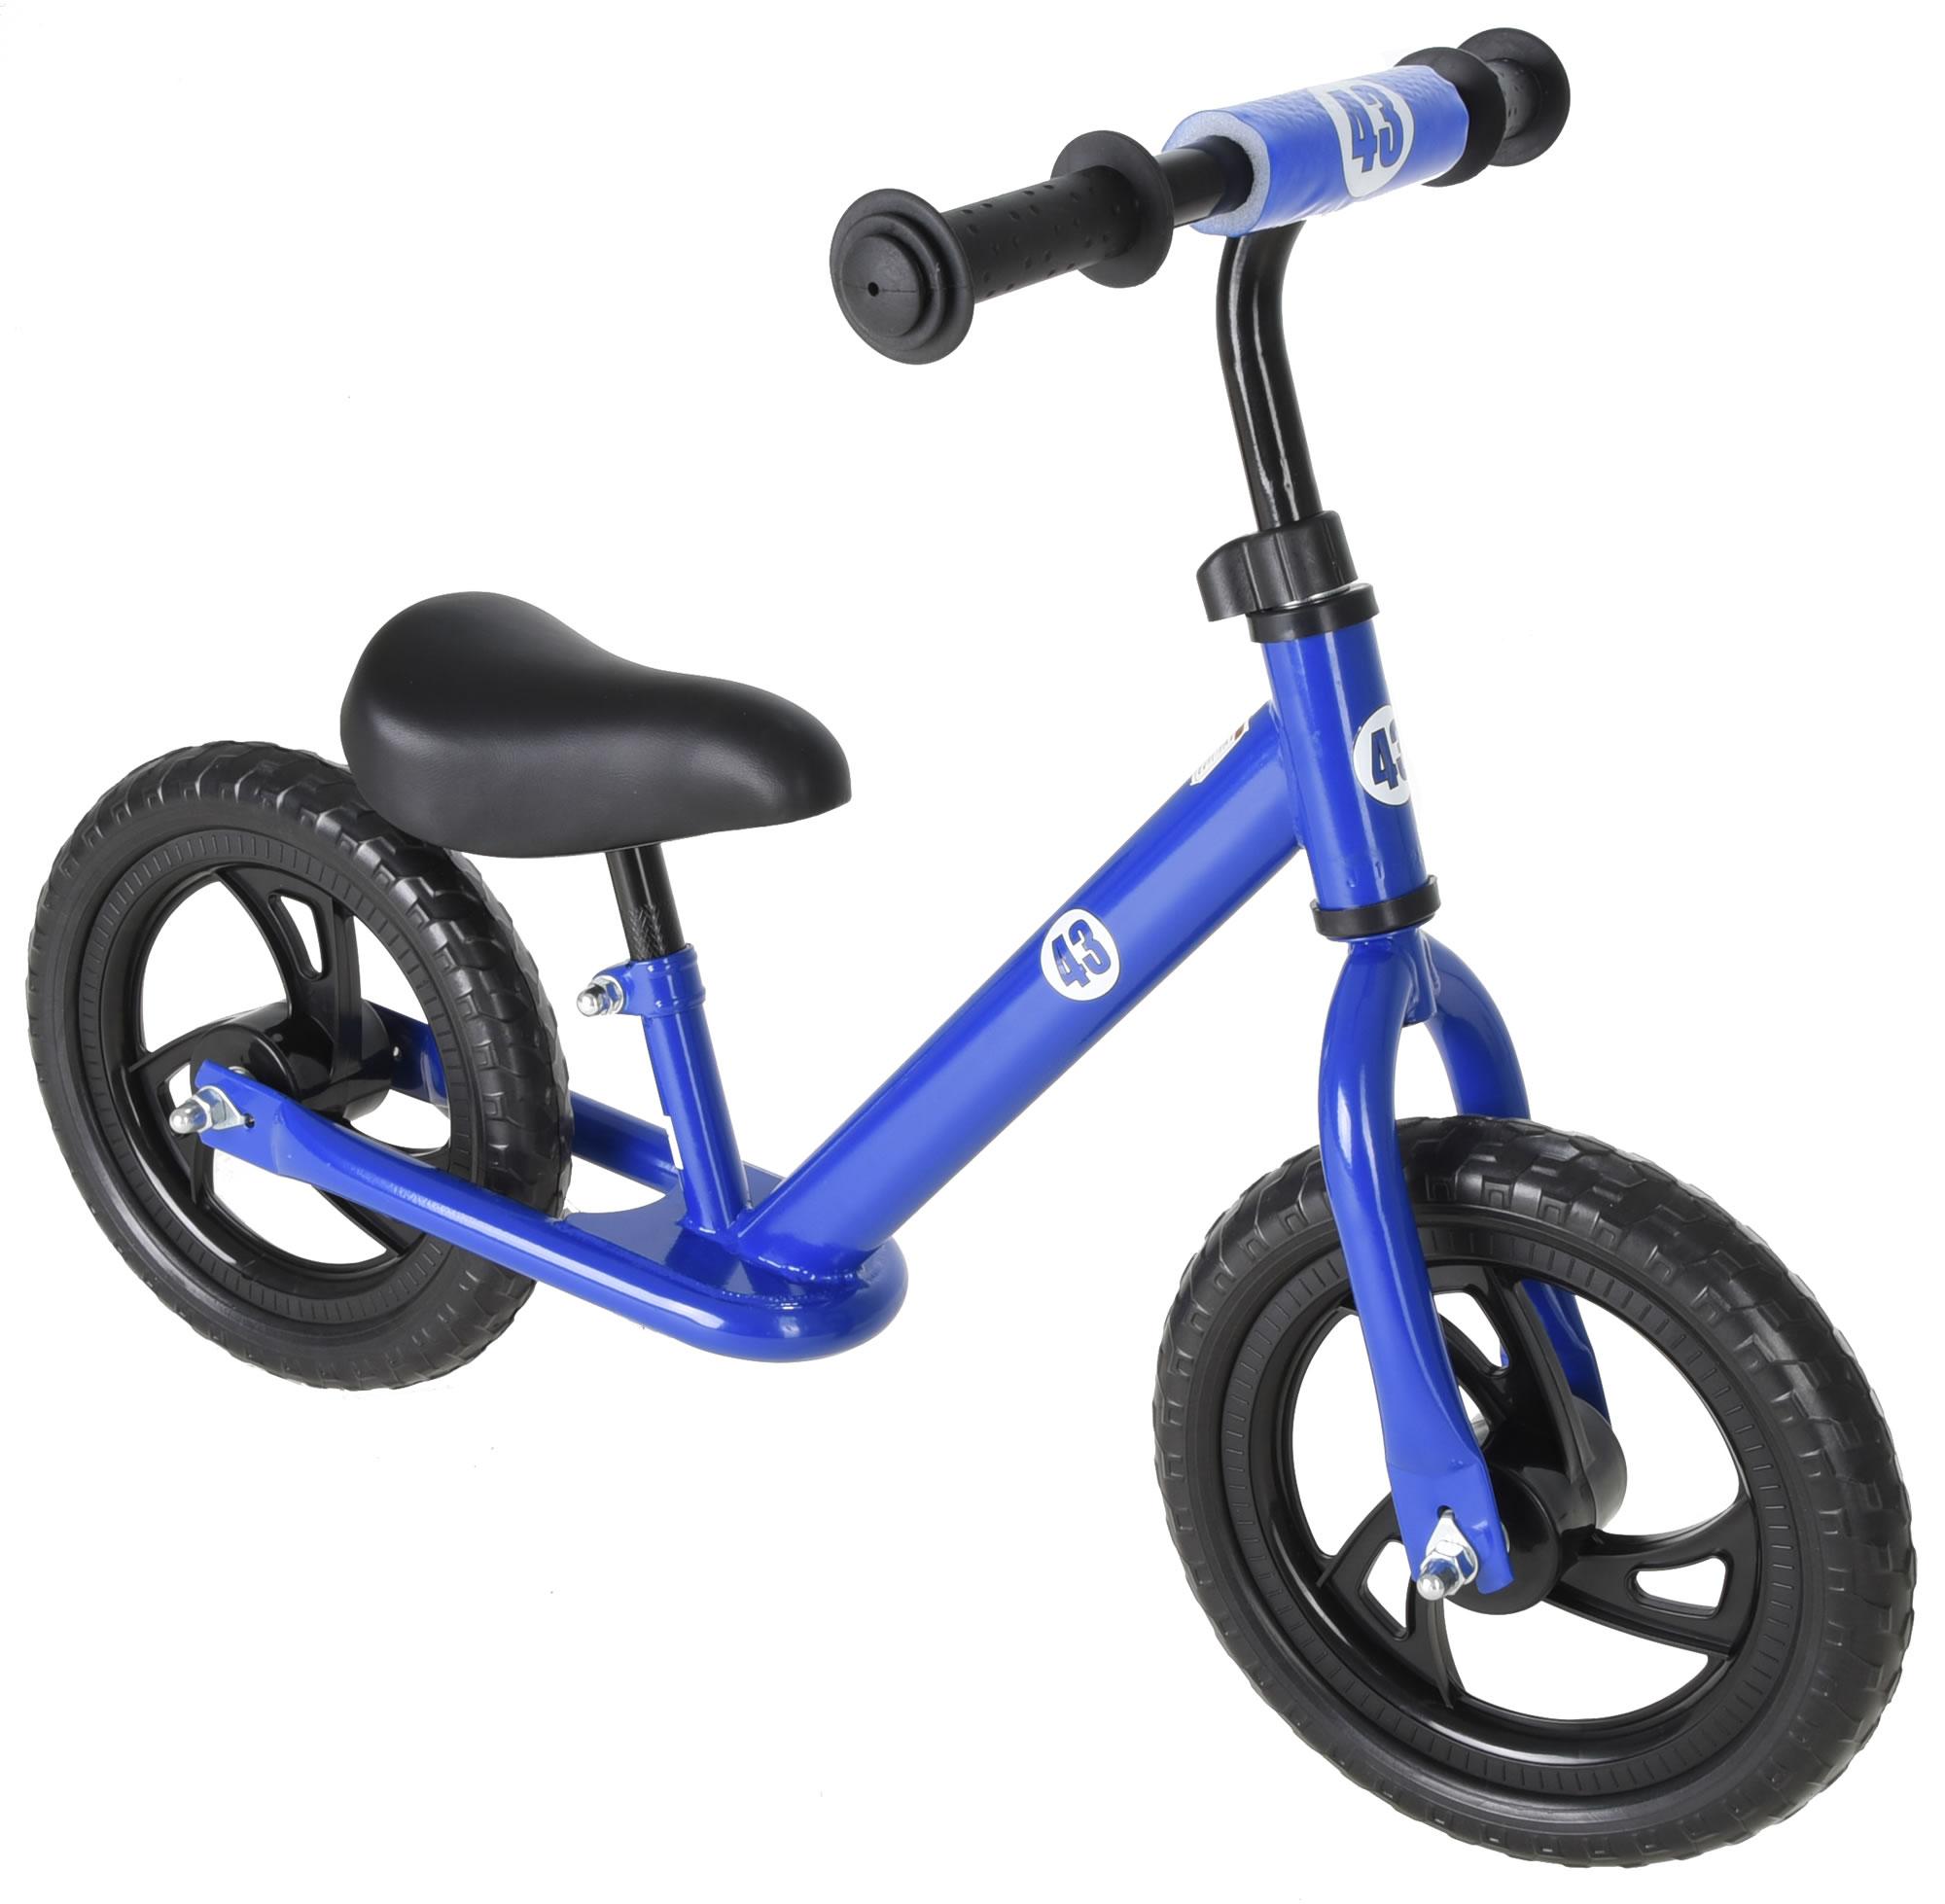 Vilano-Rally-Childrens-Balance-Bike-No-Pedal-Toddler-Push-Bicycle thumbnail 11